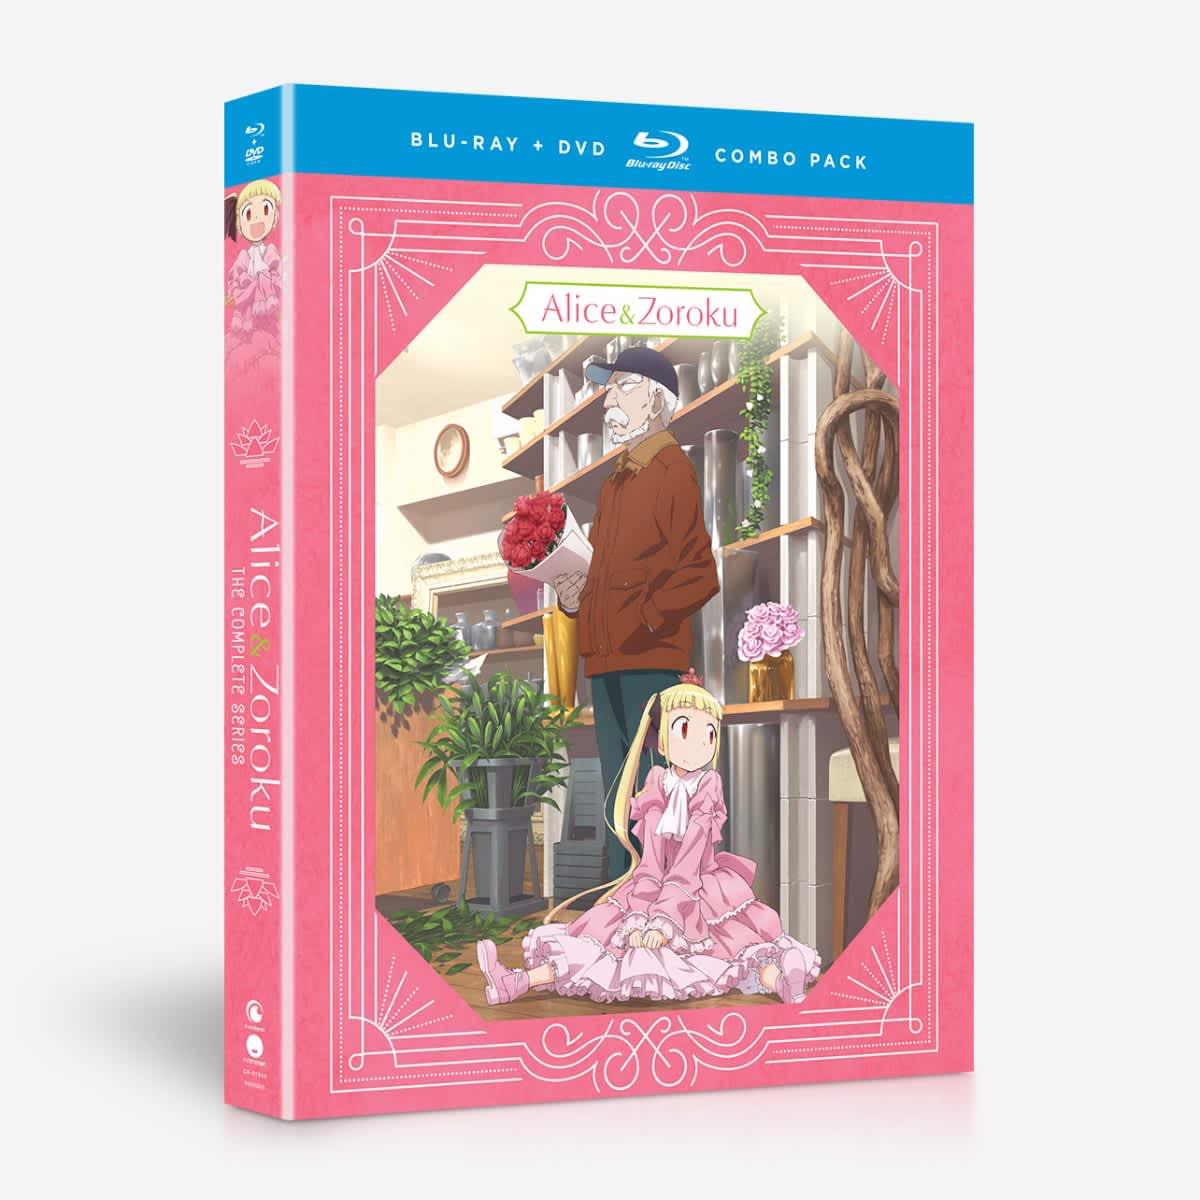 Alice and Zoroku Blu-ray/DVD 704400019456